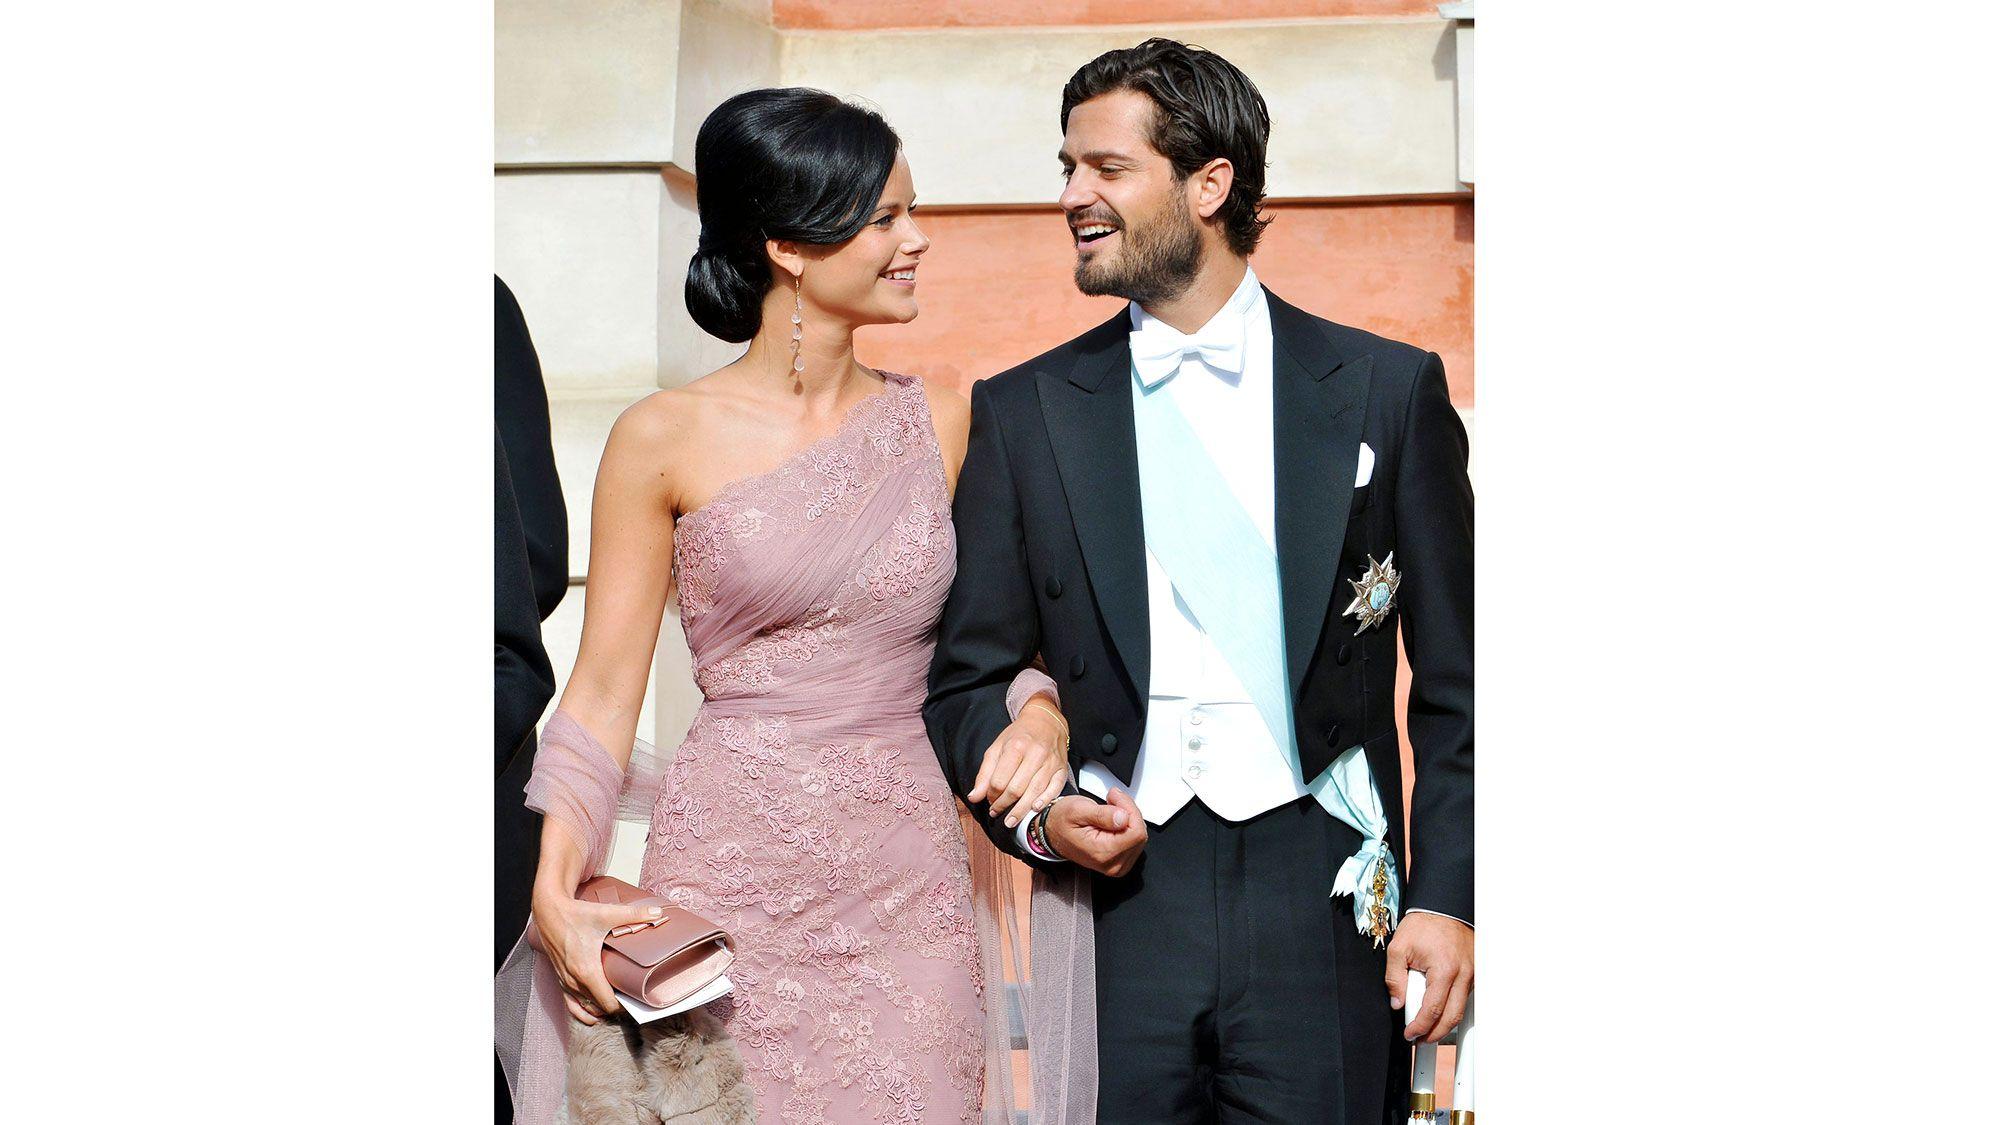 At the wedding of Gustaf Magnuson & Vicky Andren, August 2013   - HarpersBAZAAR.com